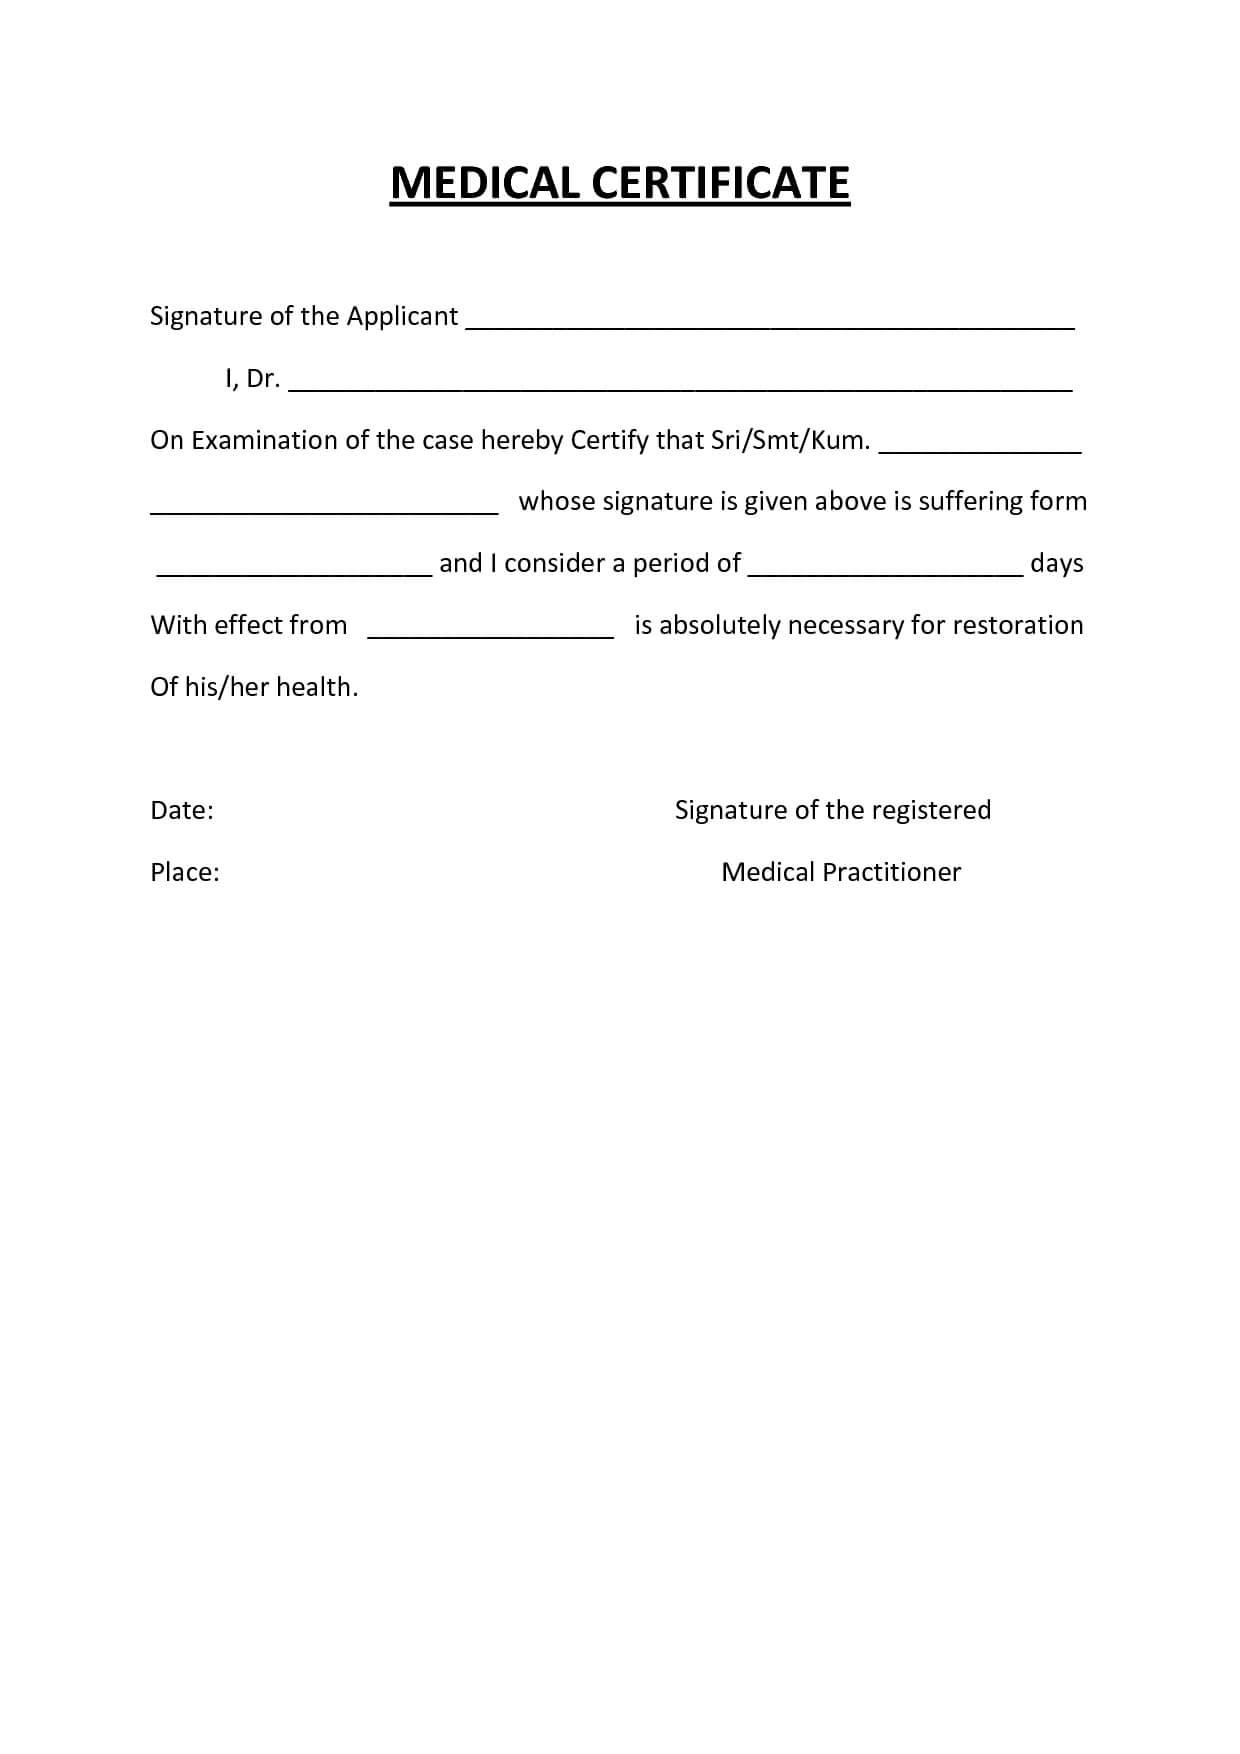 Australian Doctors Certificate Template – Atlantaauctionco Pertaining To Australian Doctors Certificate Template